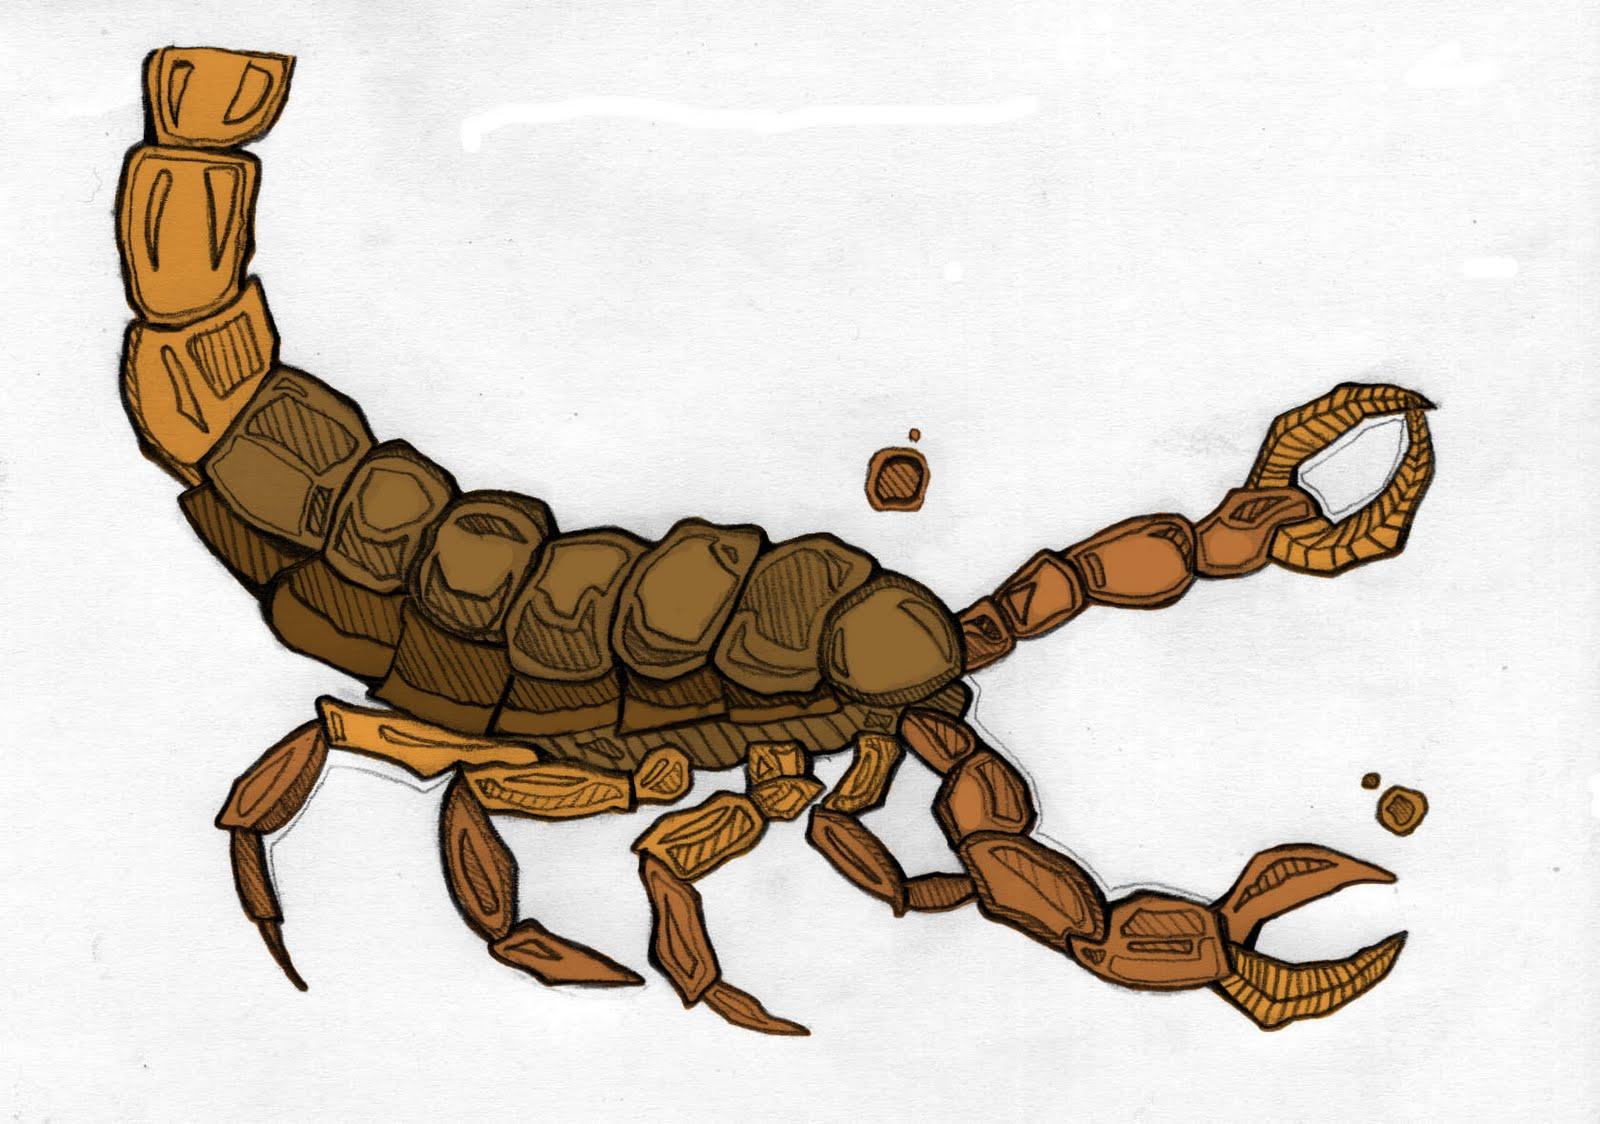 Dibujos De Escorpiones A Lapiz Imagui